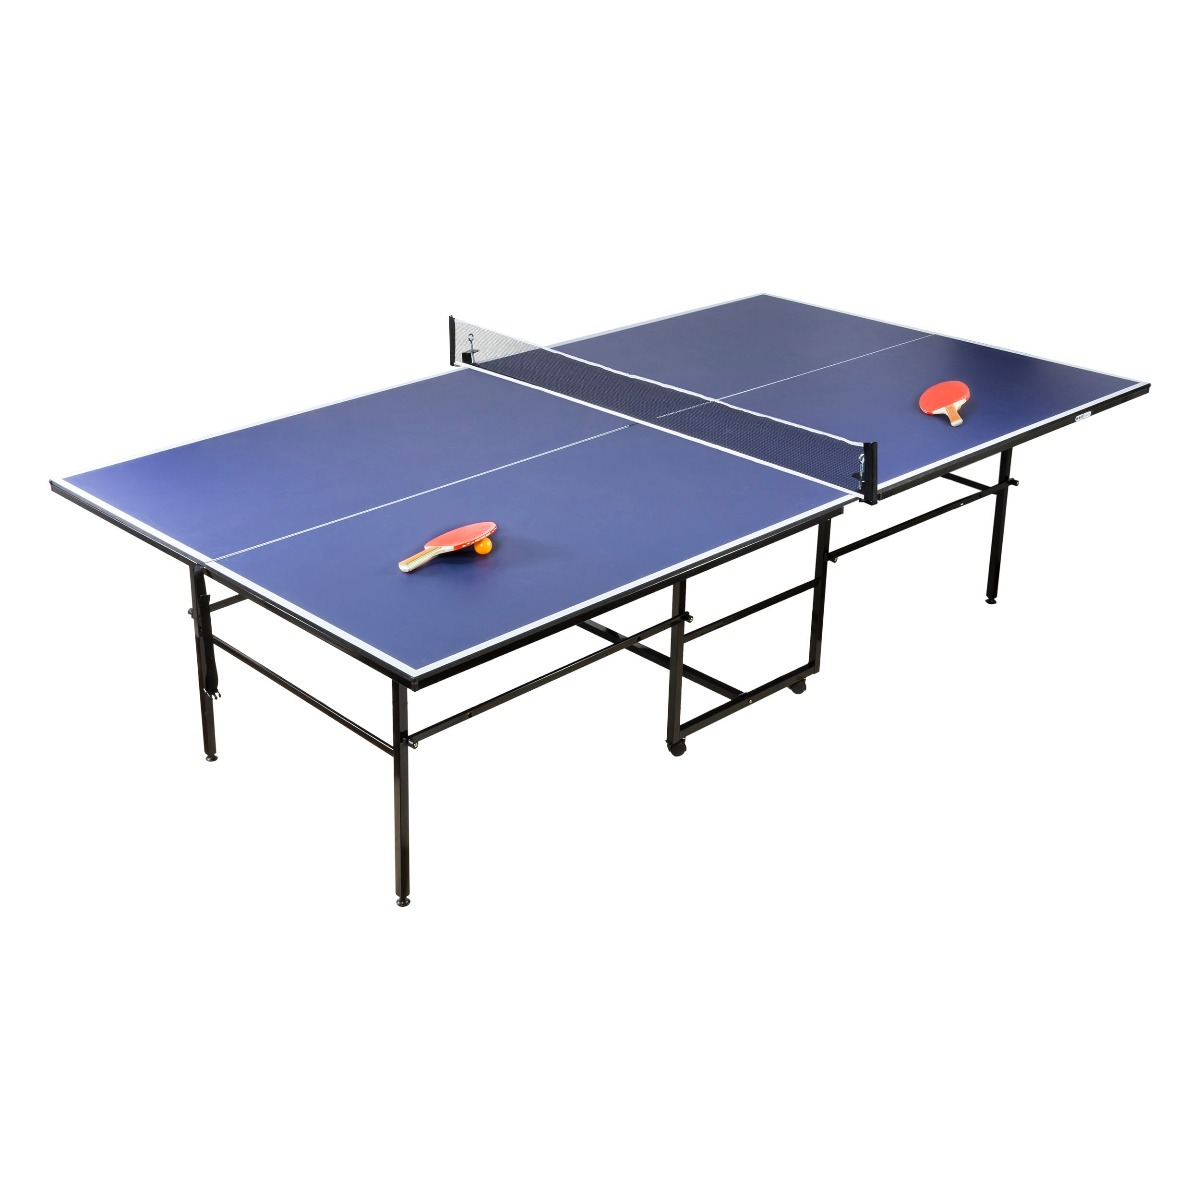 8474cefc0 Mesa Ping Pong Profesional Plegable Tenis De Mesa (video)! -   7.299 ...